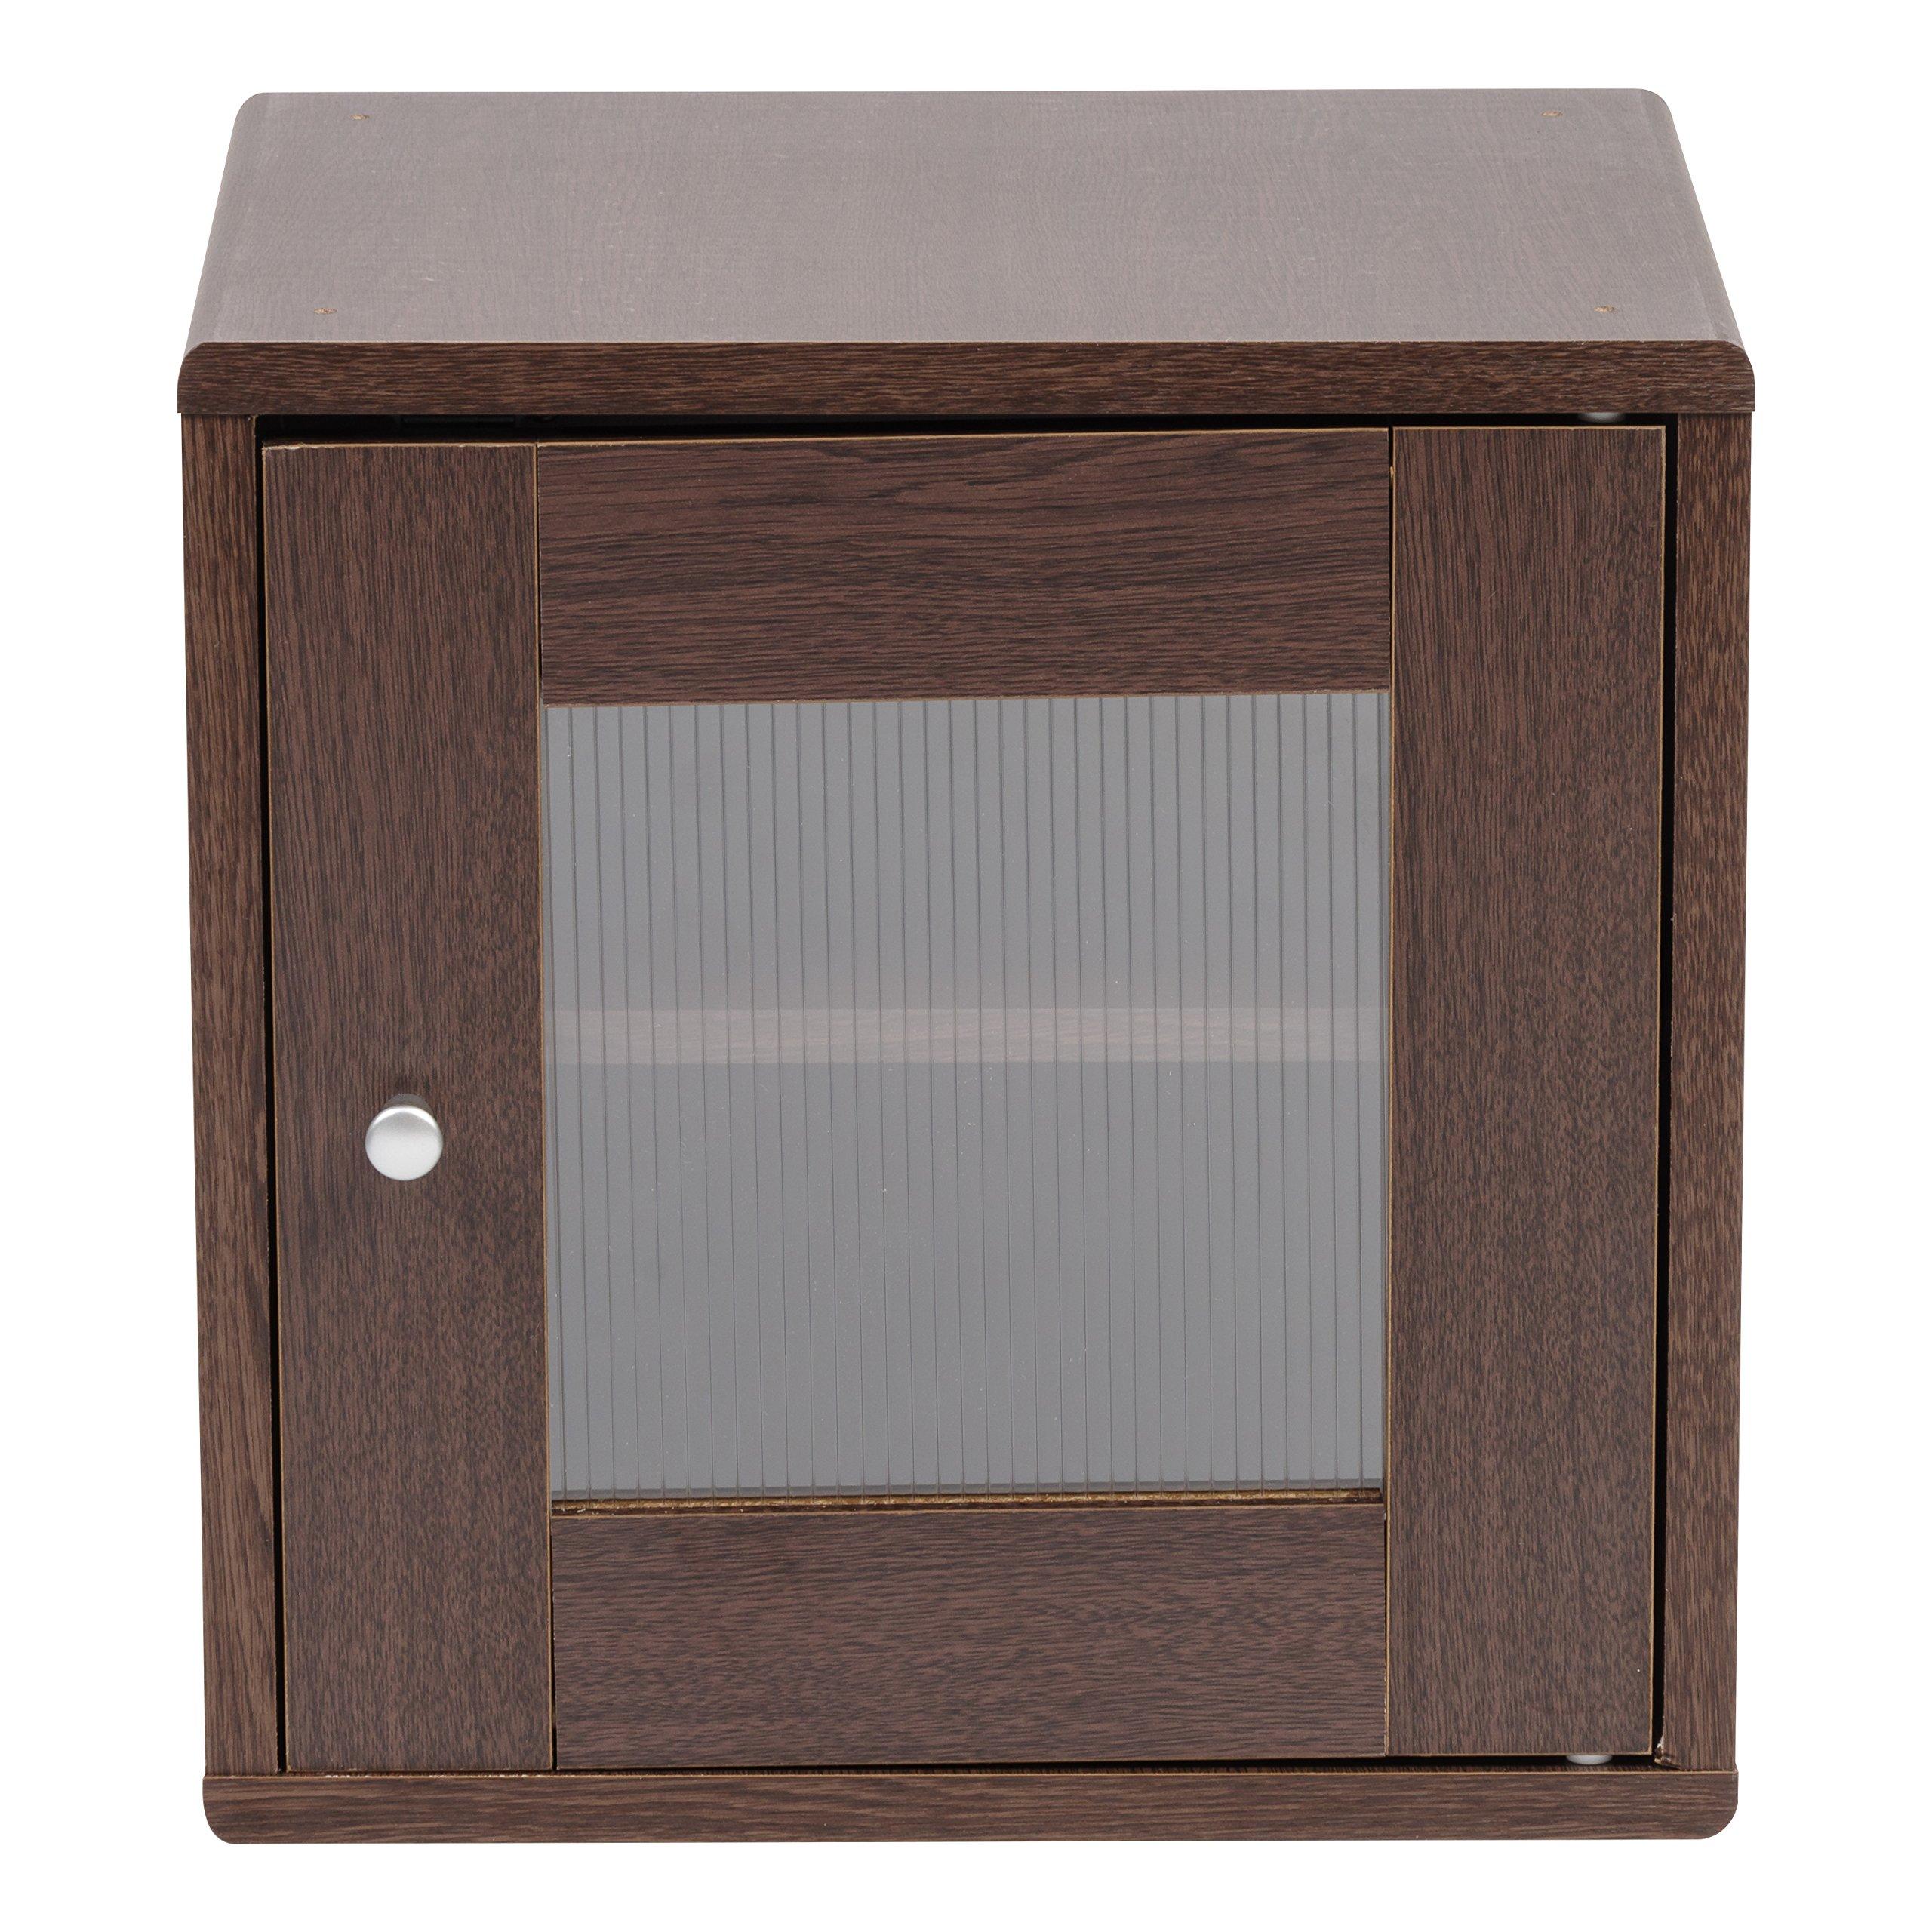 IRIS USA, QR-34PDT, Wood Storage Cube with Window Door, Brown Oak, 1 Pack by IRIS USA, Inc. (Image #2)